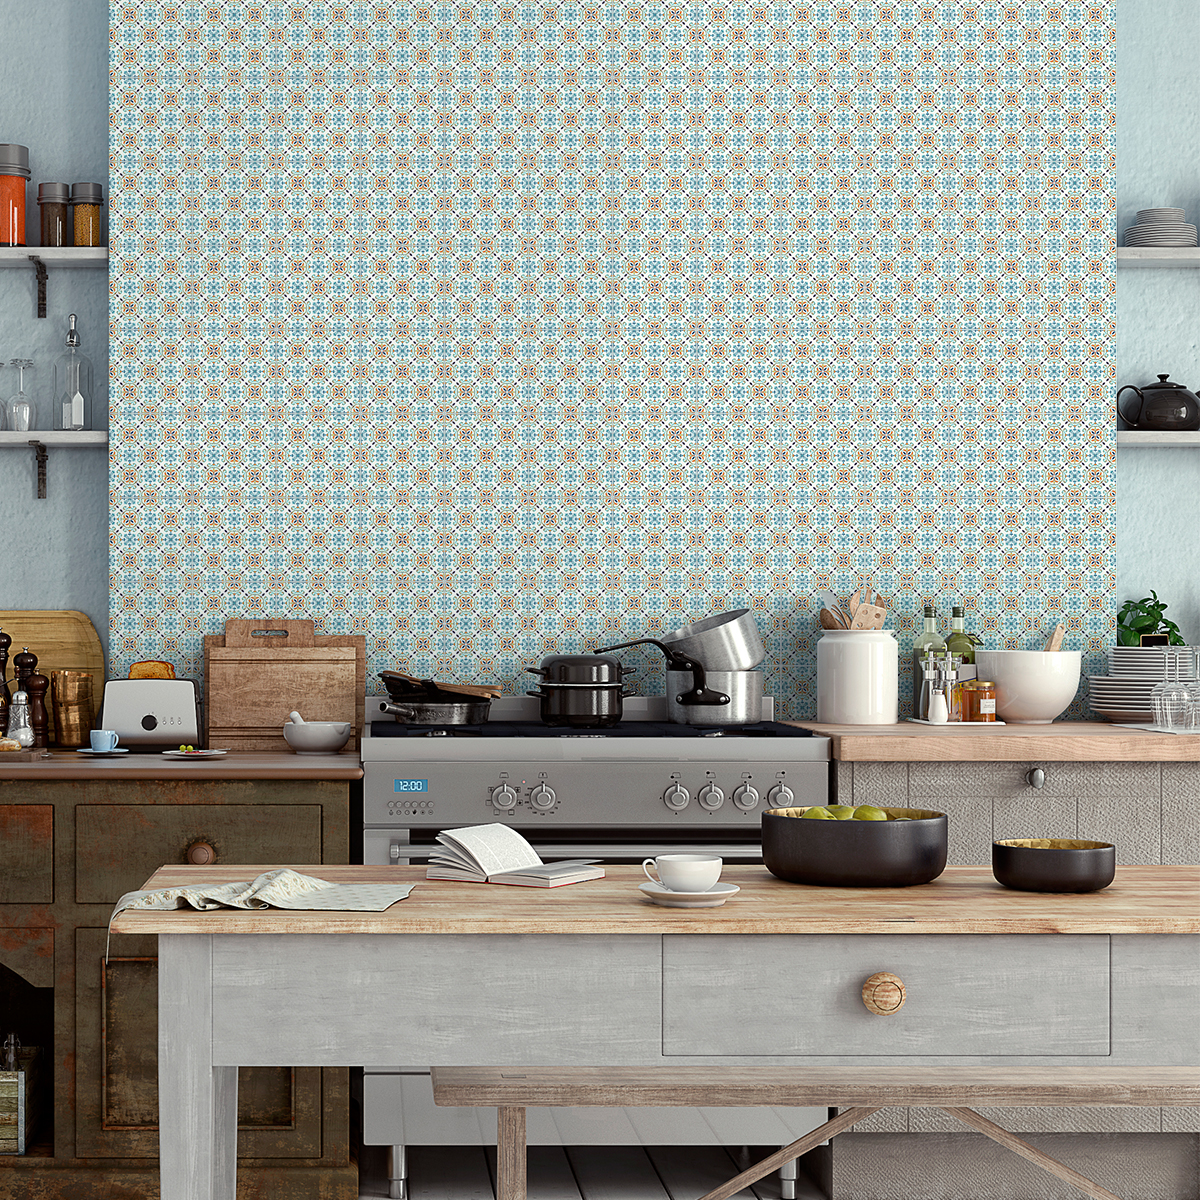 60 stickers carreaux de ciment azulejos mariano cuisine. Black Bedroom Furniture Sets. Home Design Ideas